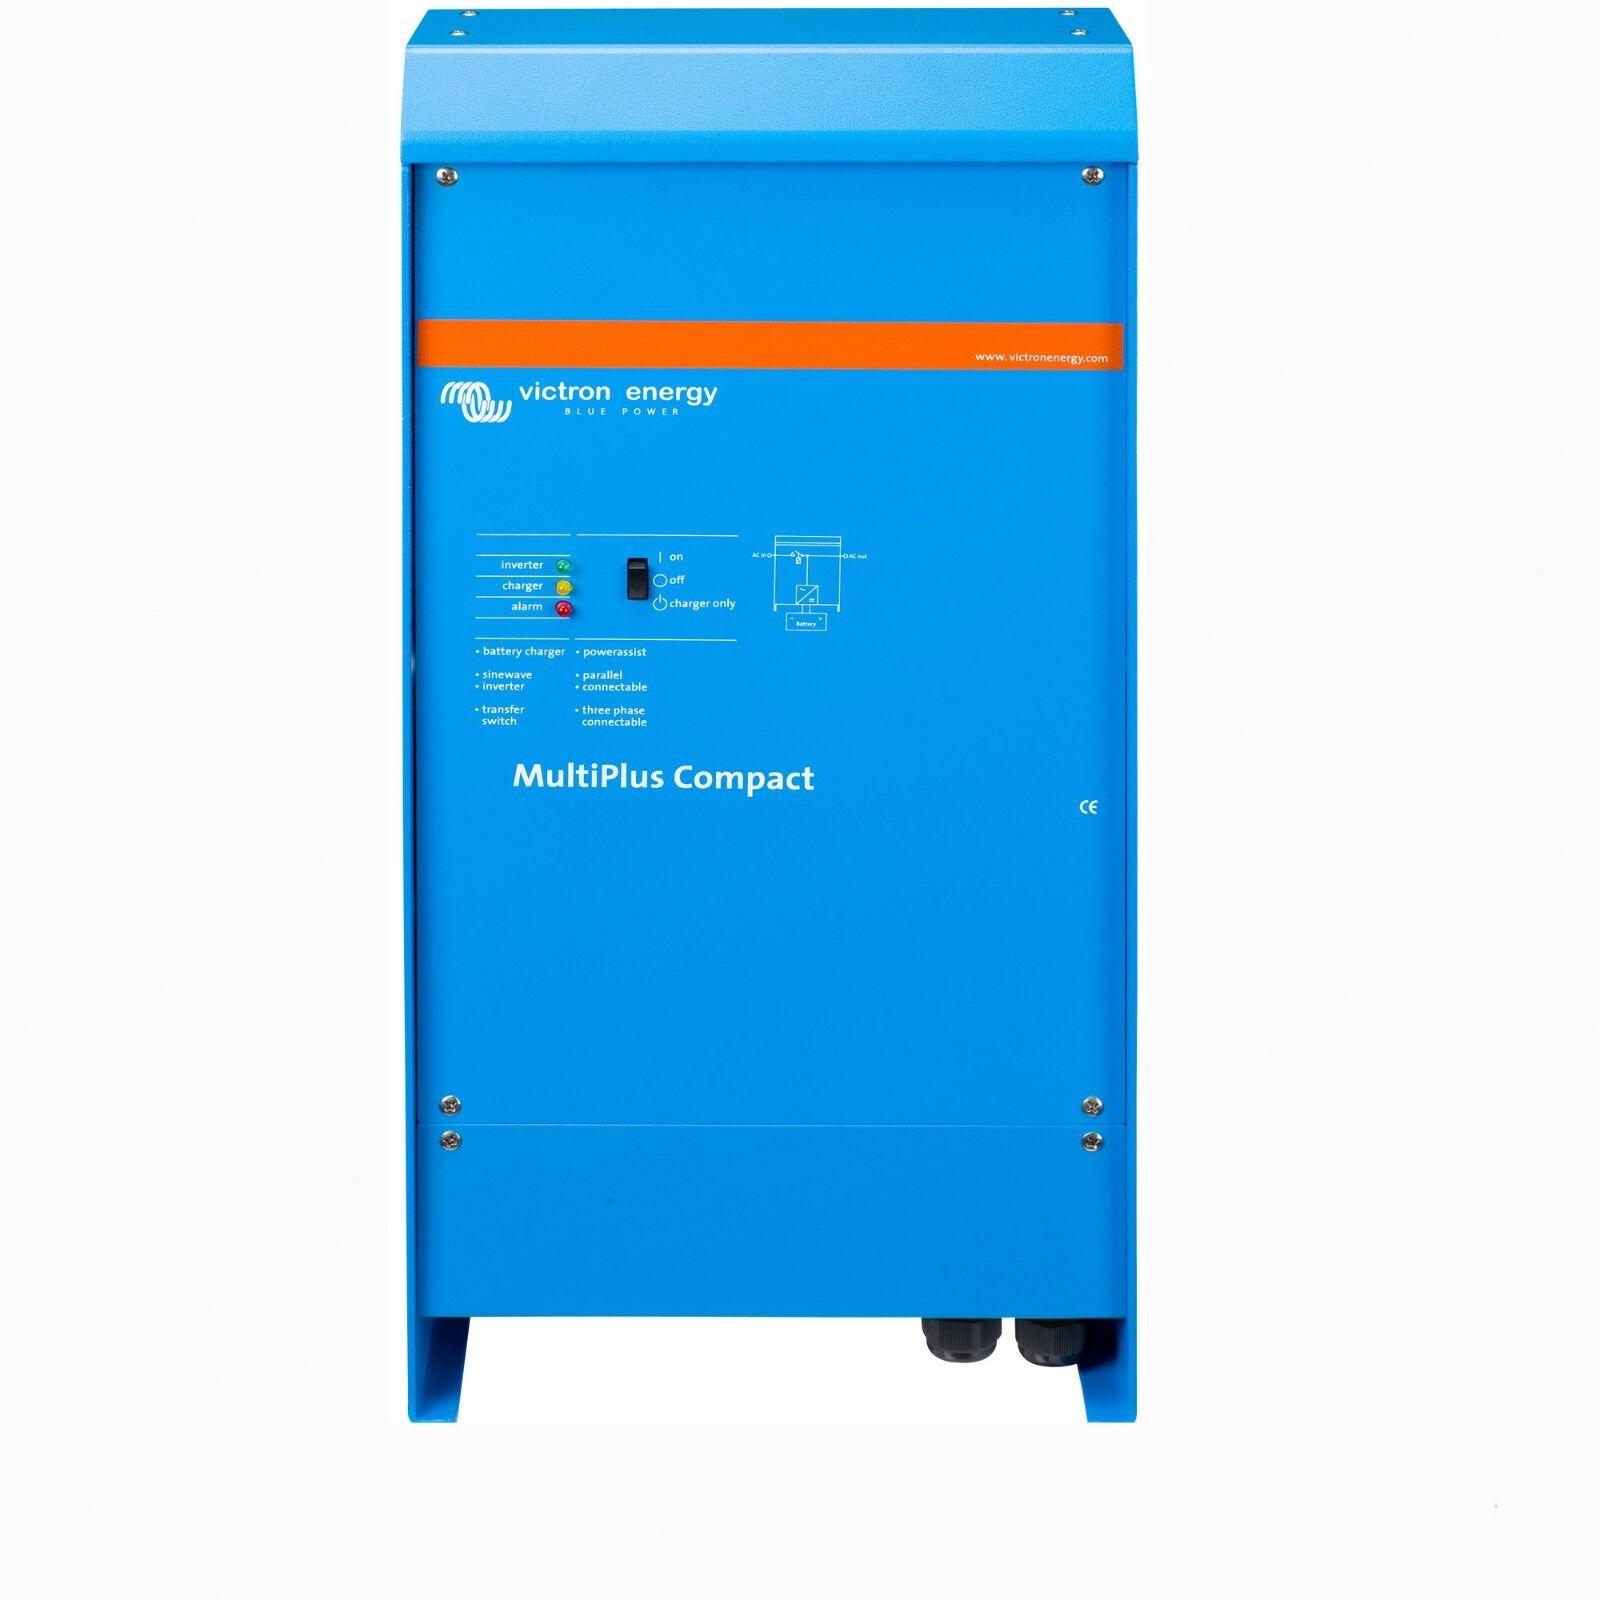 VICTRON Inverter MultiPlus C 24/1600/40-16 Ladegerät Wechselrichter Charger Inverter VICTRON 4dfa58